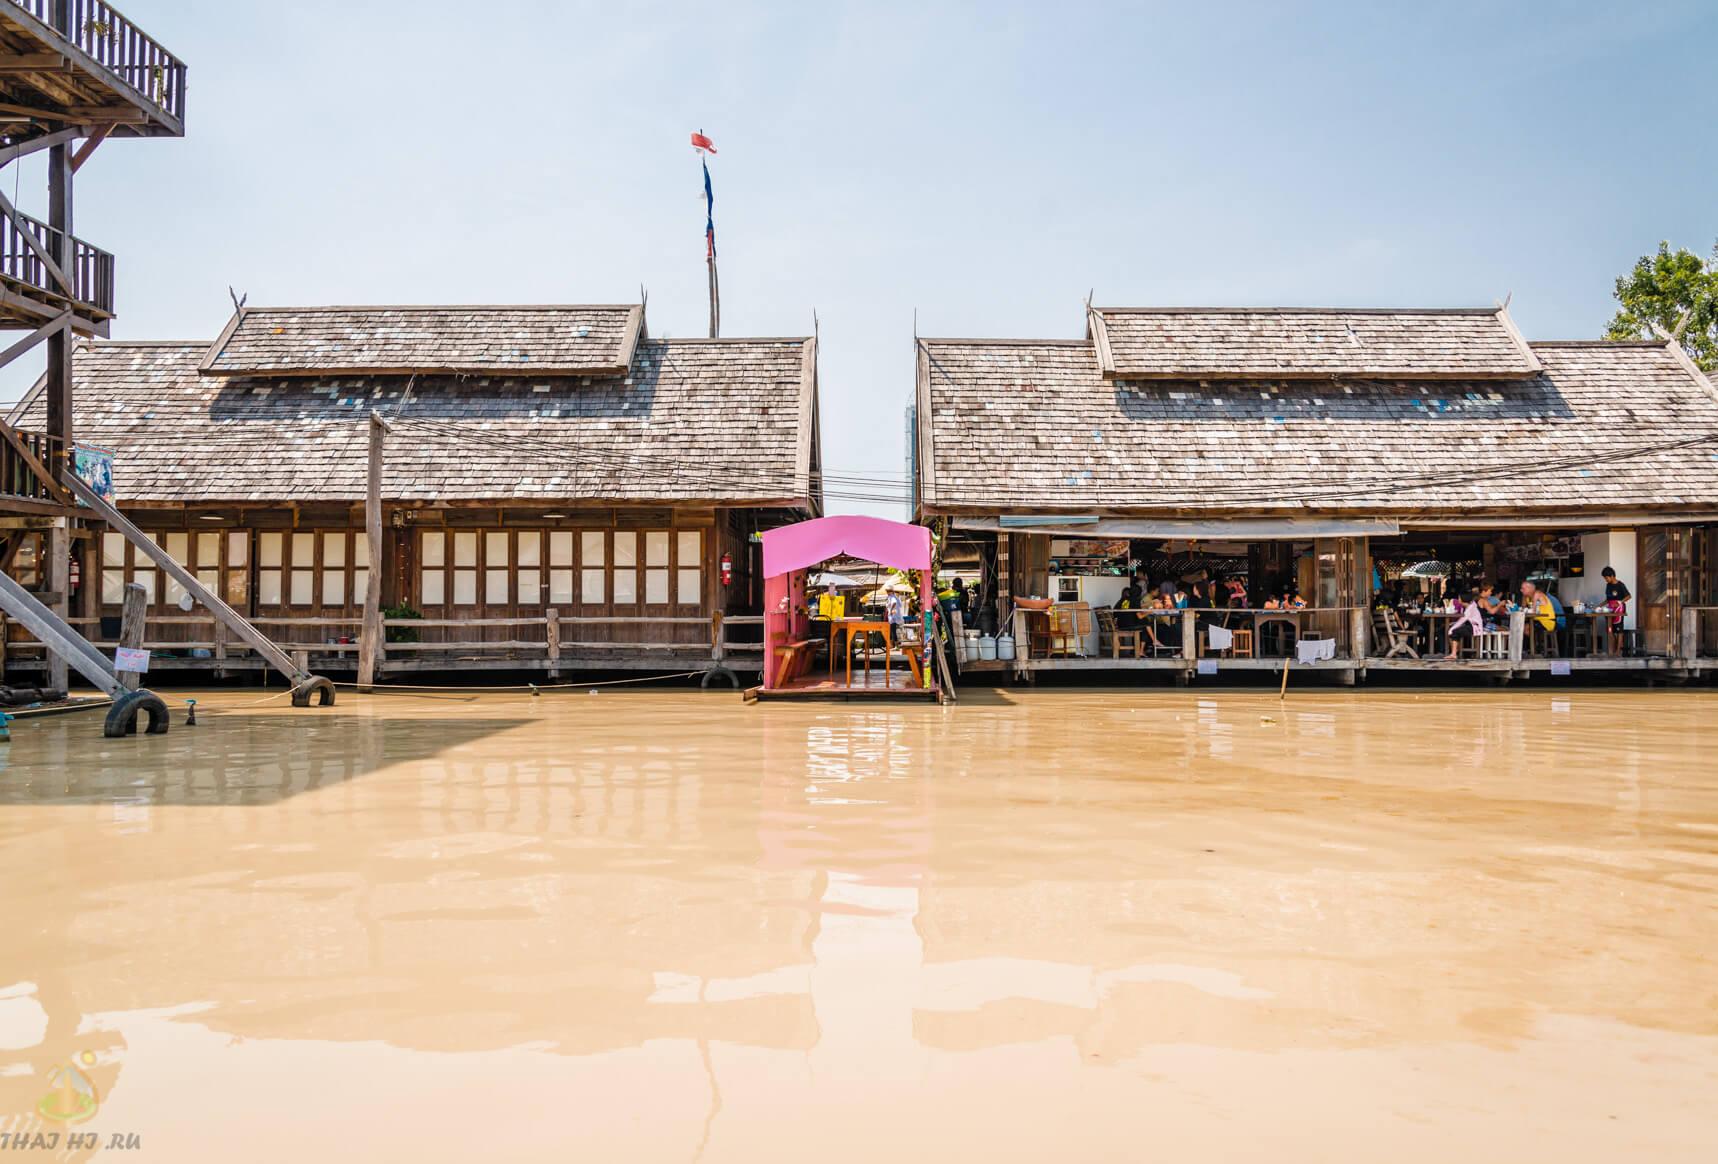 Катамараны на плавучем рынке